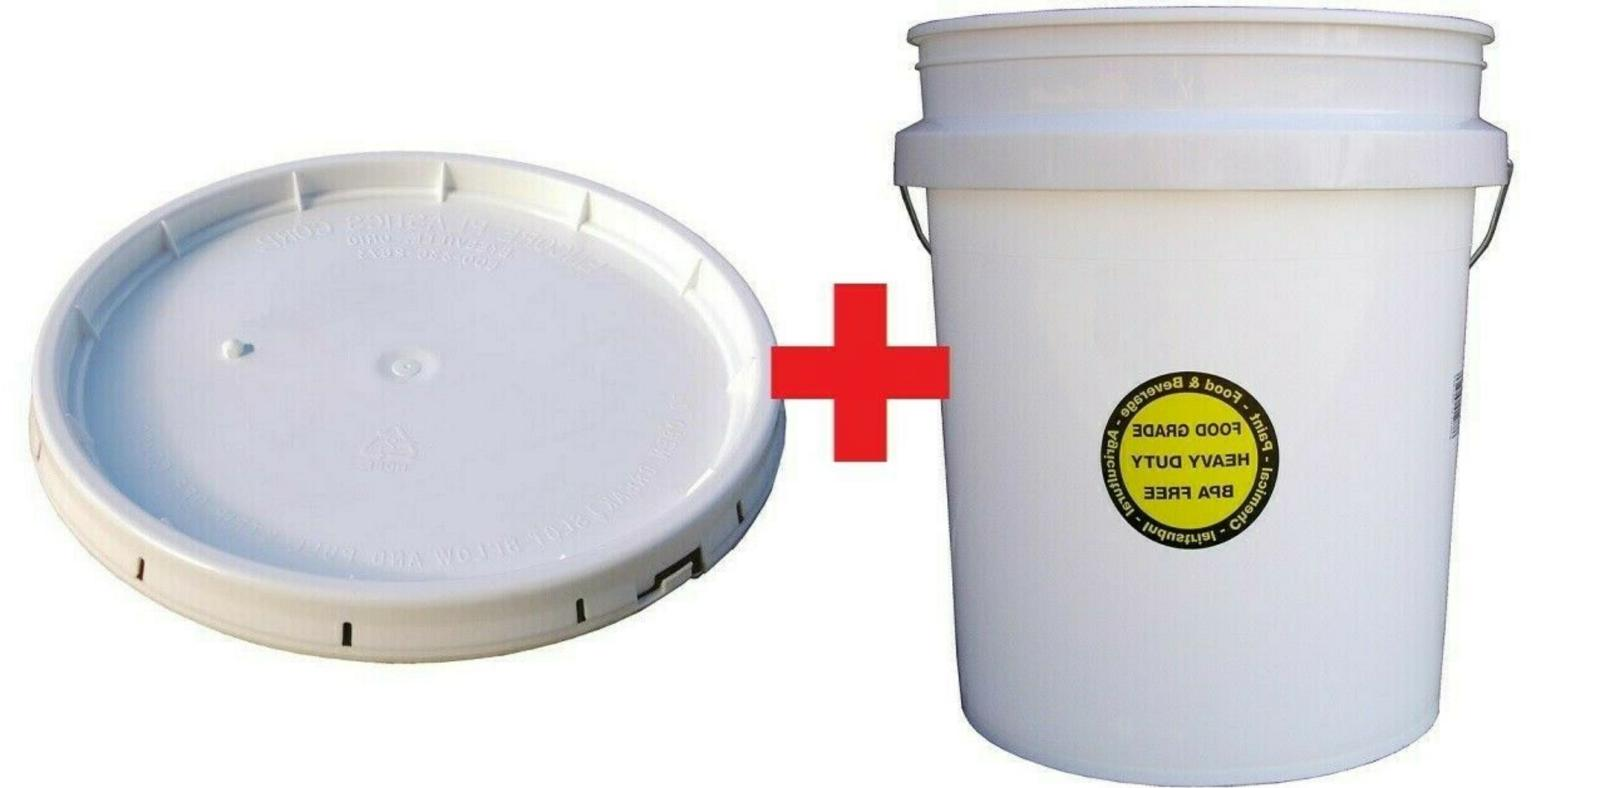 purpose durable commercial food grade